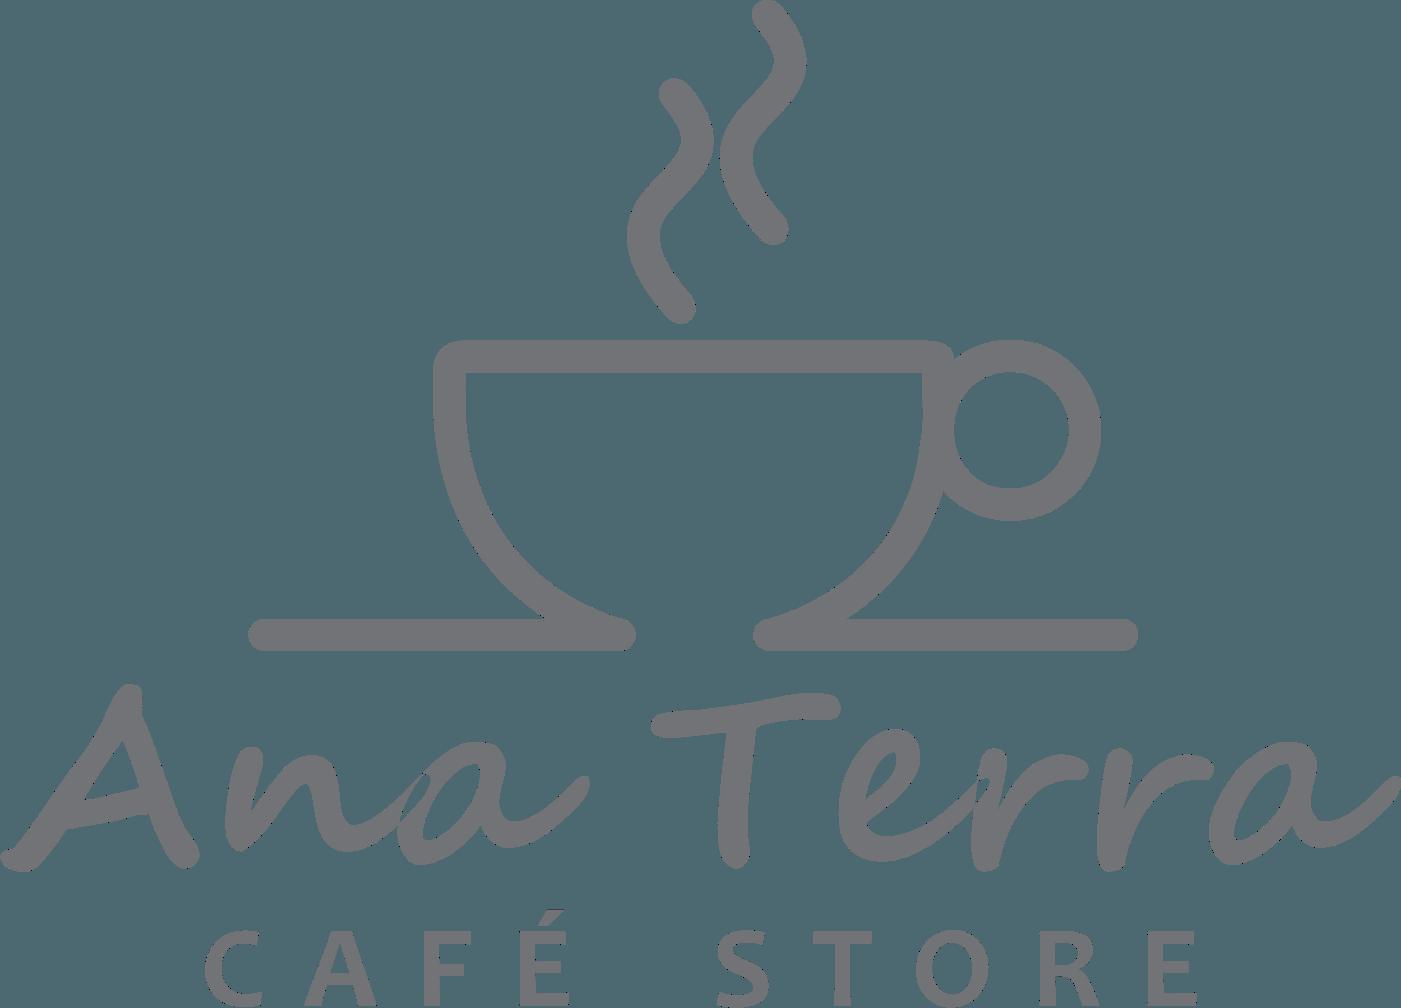 ana-terra-cafe